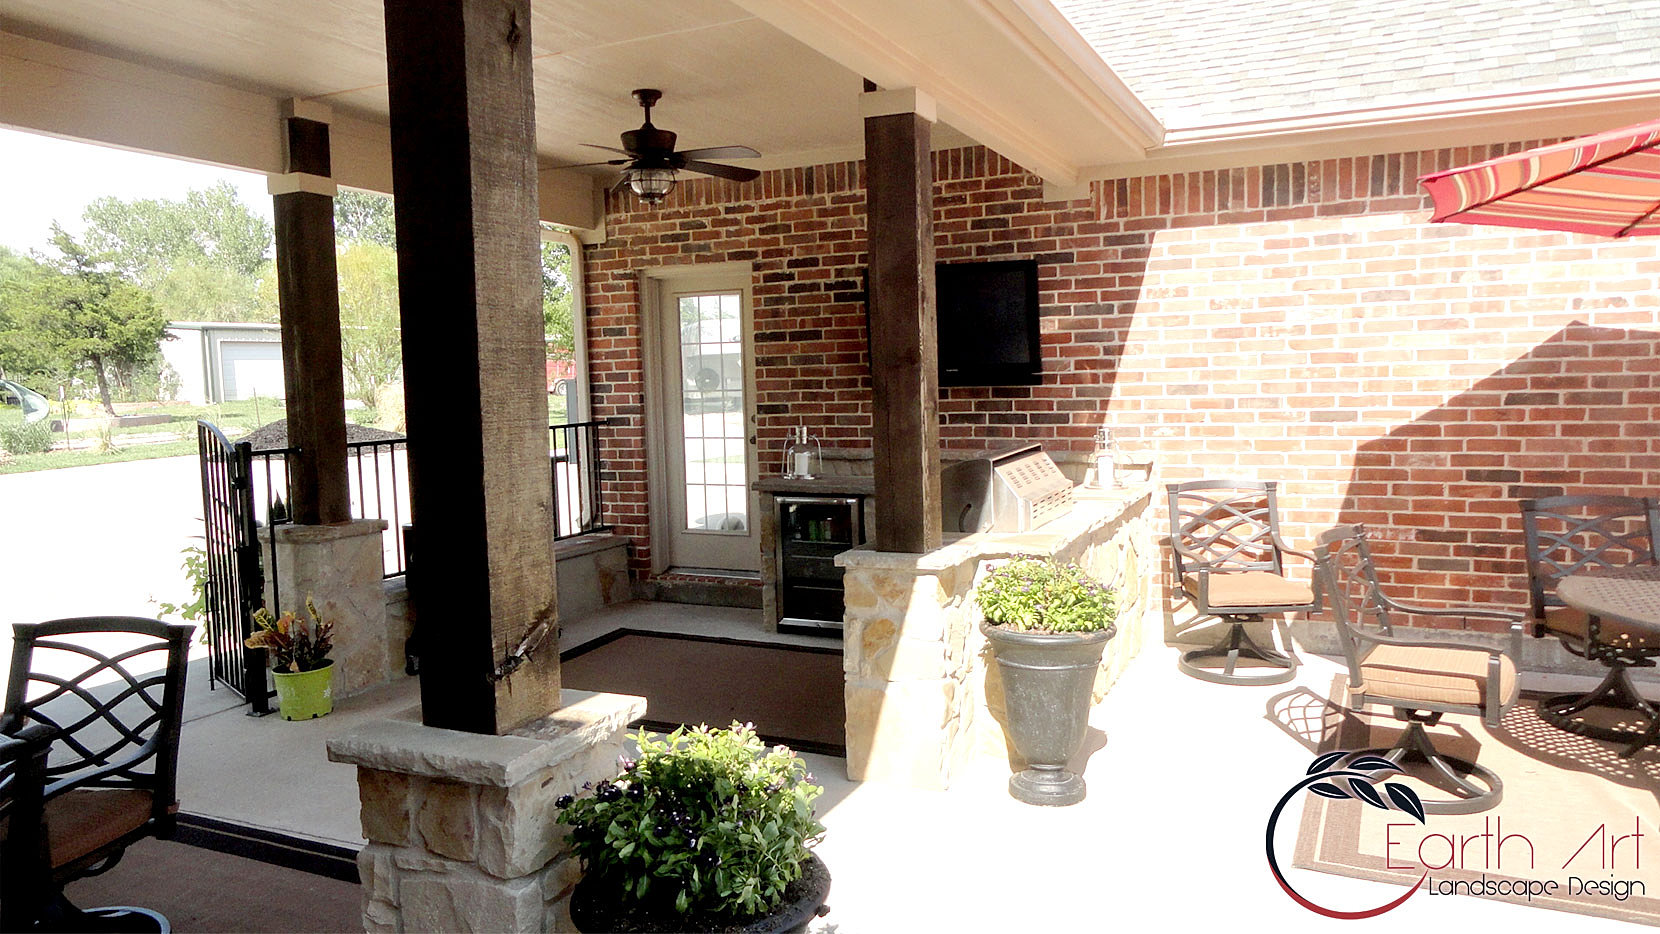 Earth art landscape design rockwall texas stone for Dallas outdoor kitchen designs